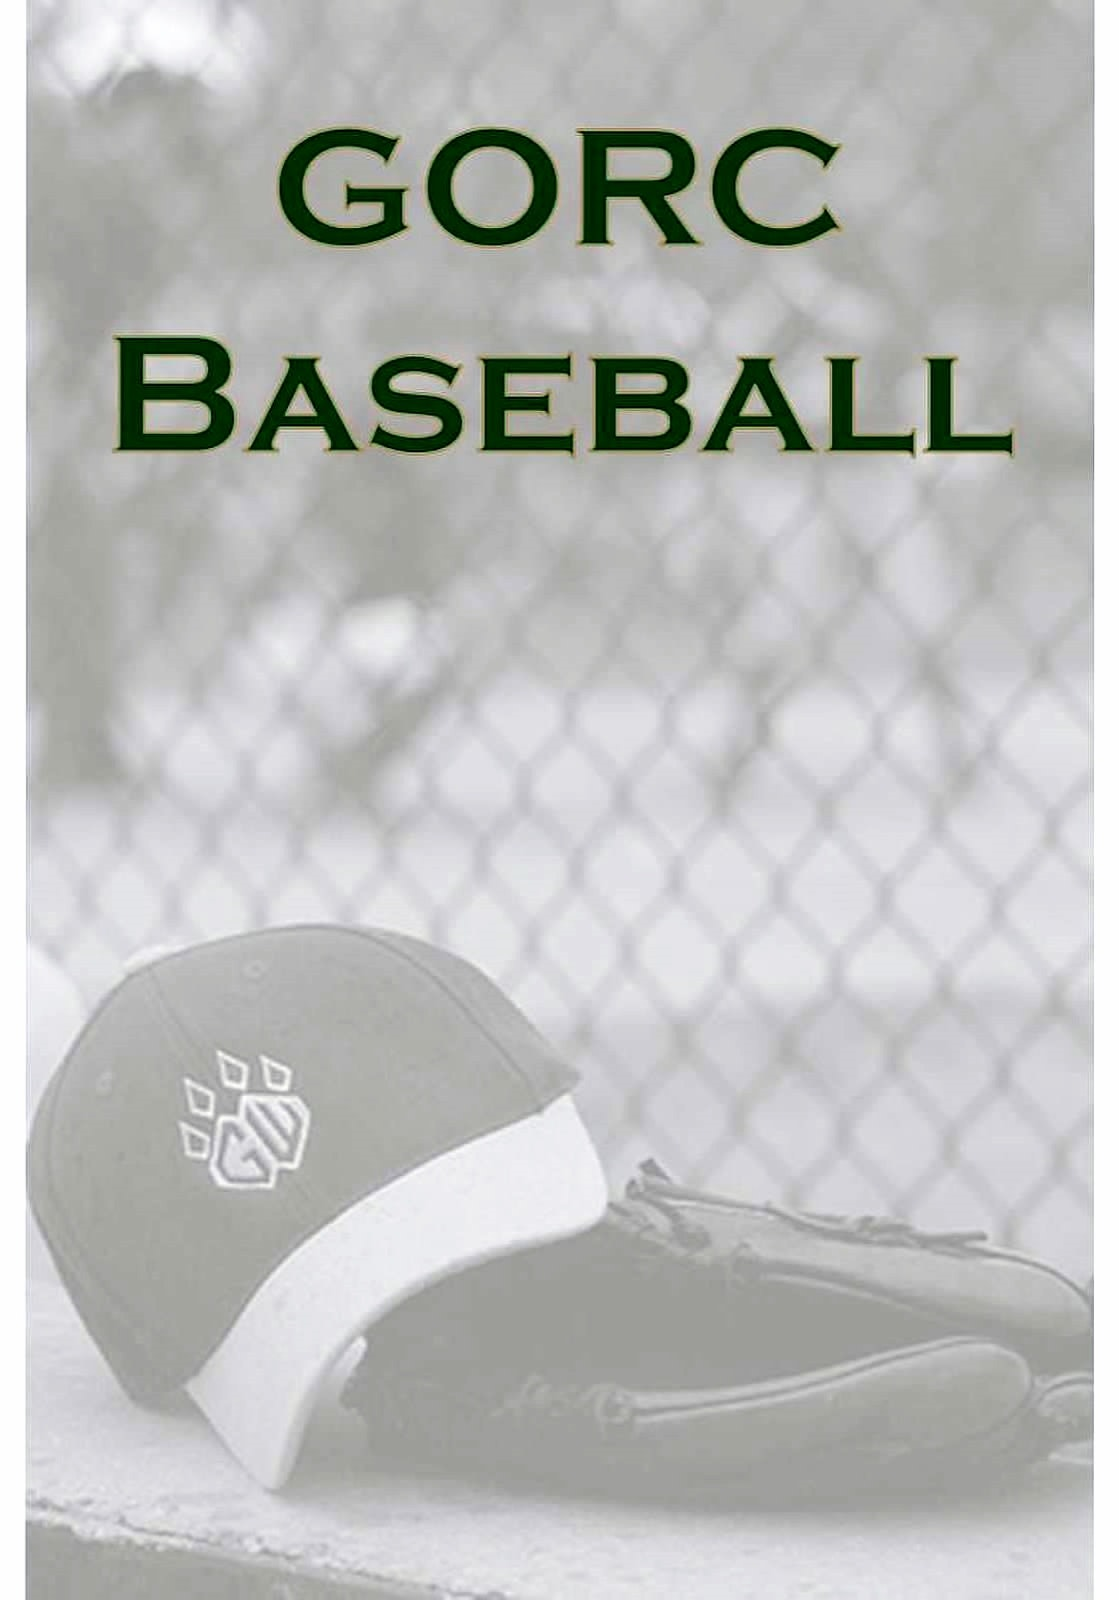 GORC 9U Baseball